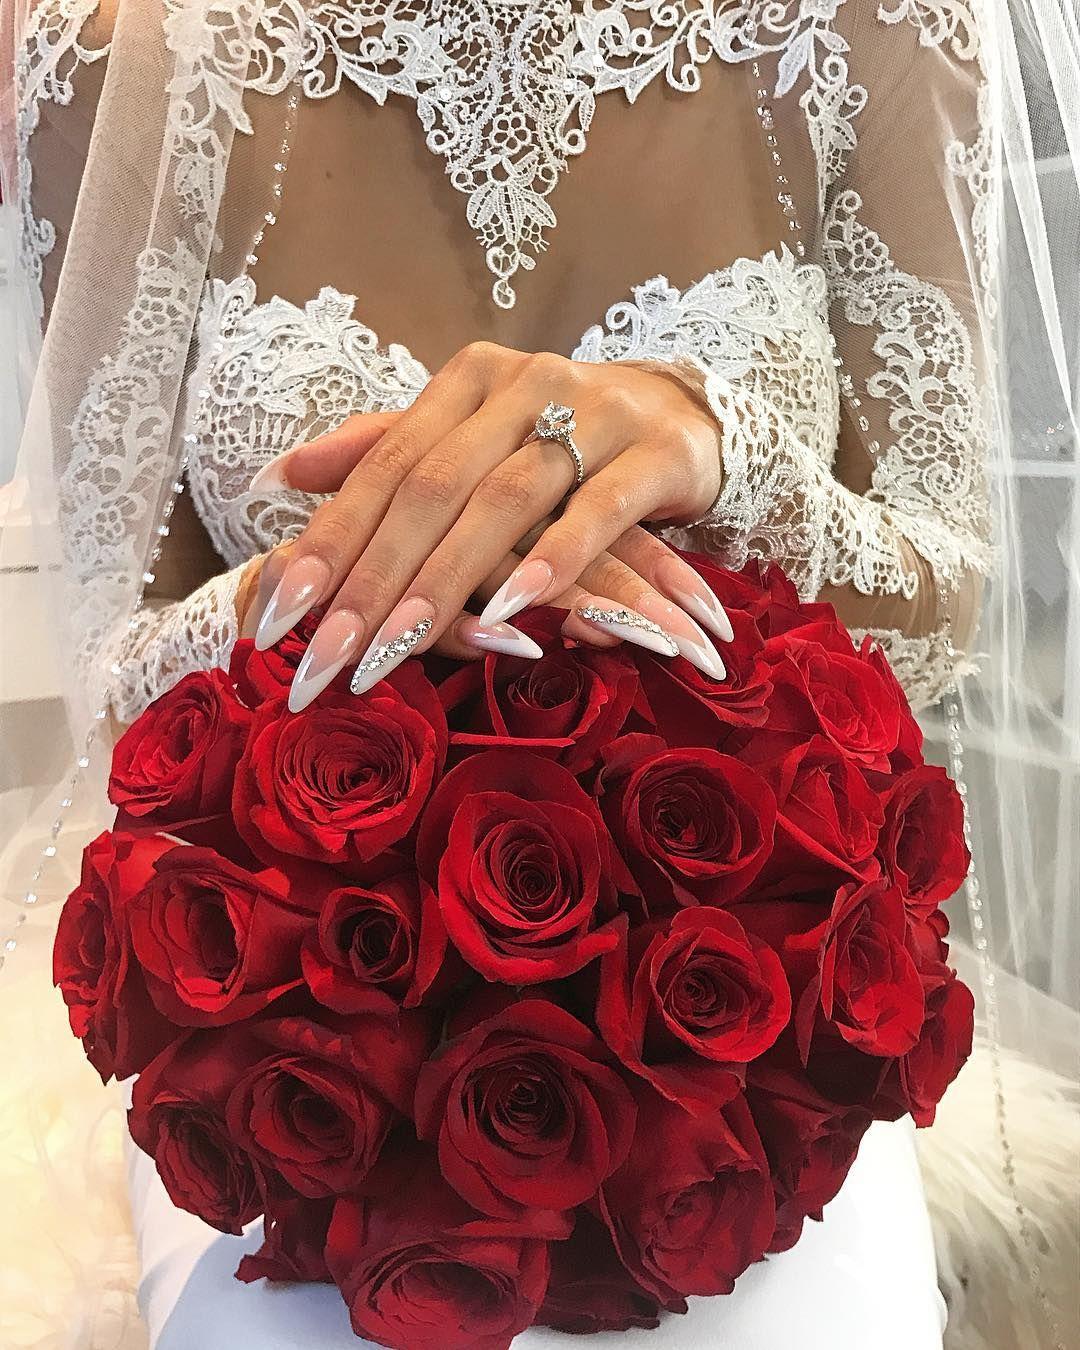 Fashion Flowers And Girl Image Red Rose Wedding Silk Flowers Wedding Wedding Arrangements [ 1350 x 1080 Pixel ]